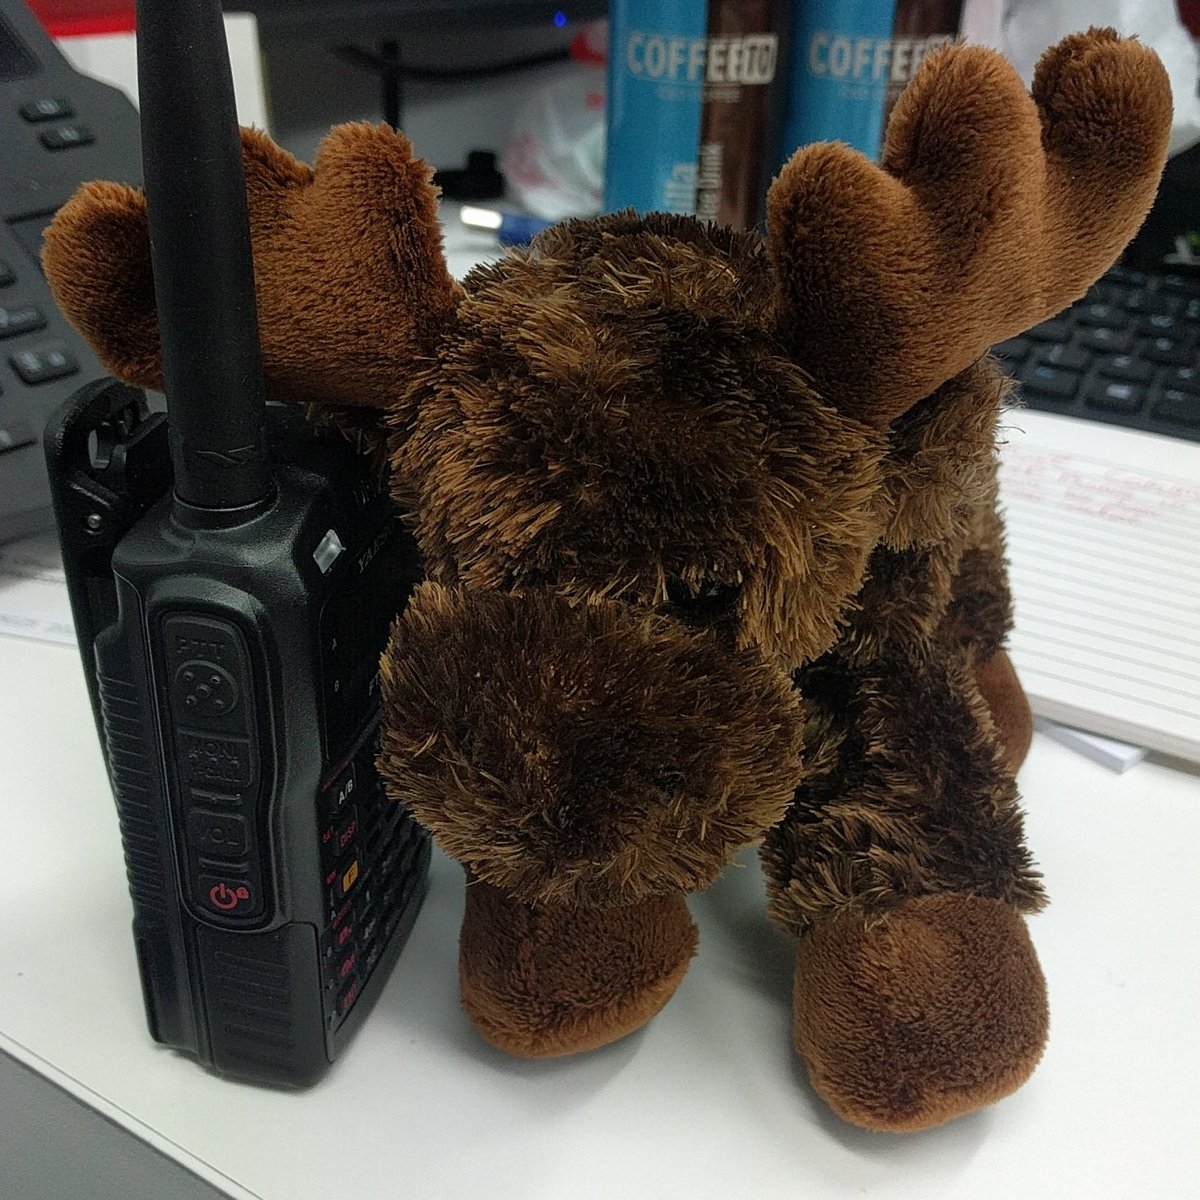 Radio Chatter! 📻 #HavocTechie // #cqcq #morris calling #cq  #AmateurRadio #hamradio #plushie #plushiesoftwitter  #BravoCharlieRadio  https://bcrlivestream.com/havoctechie/